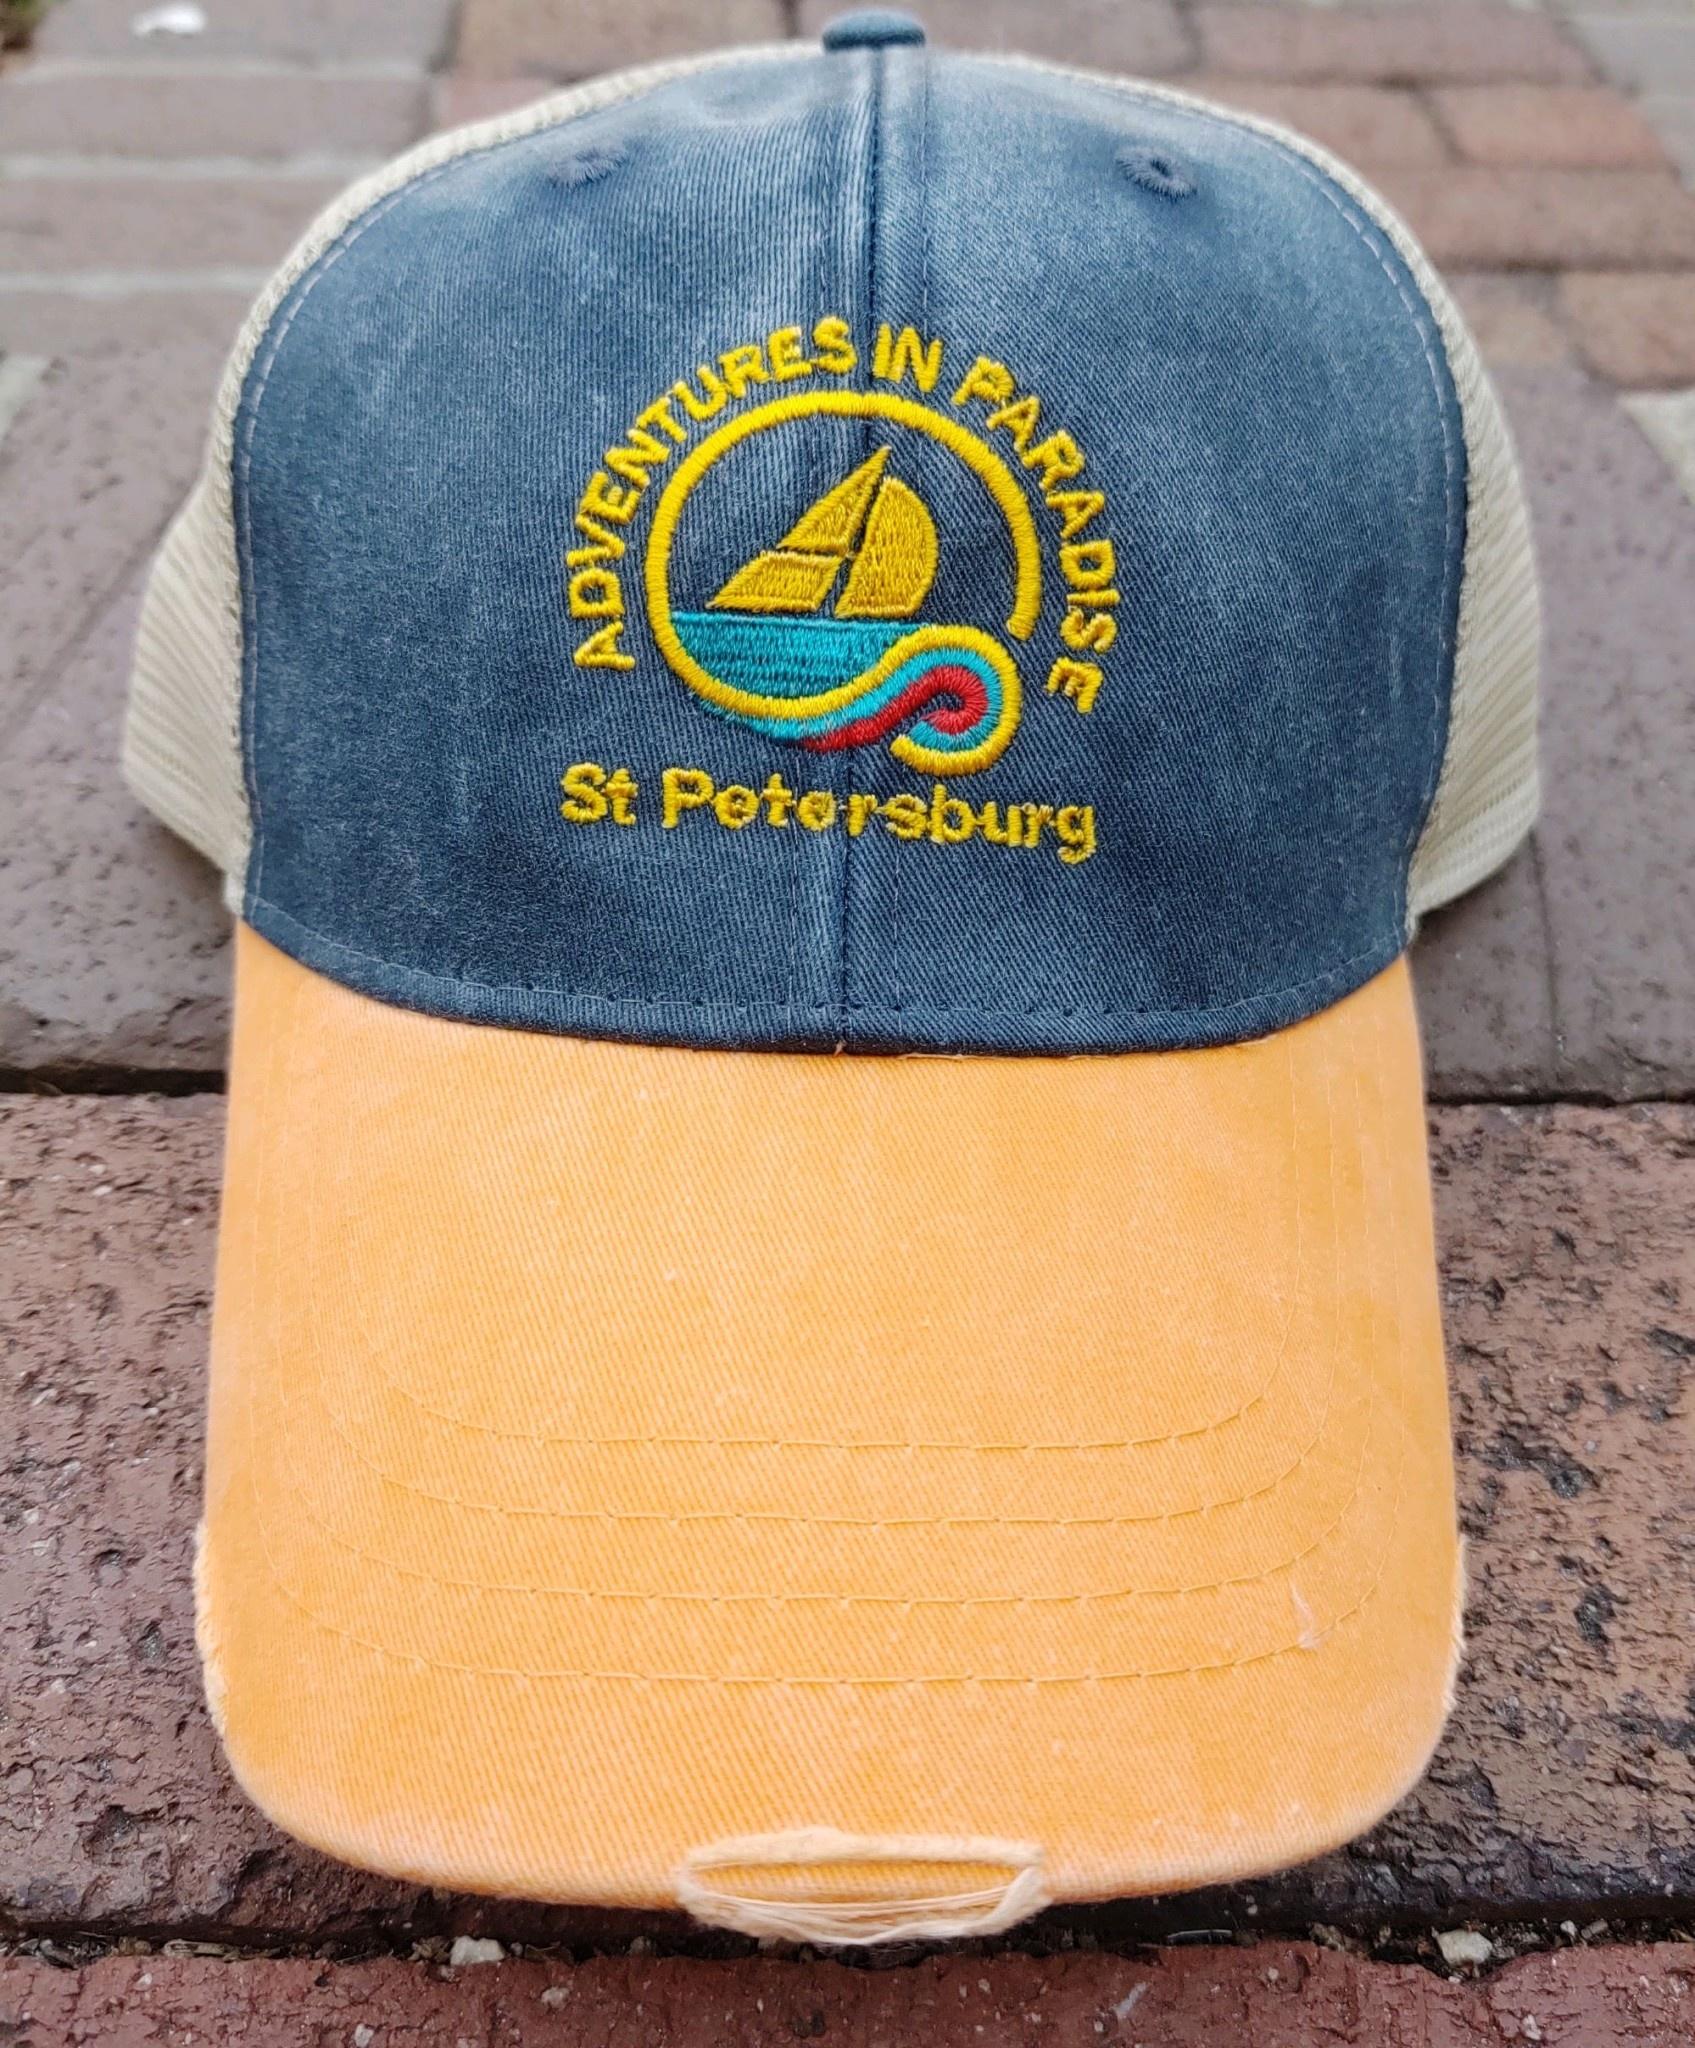 WHISPERING PINES AIP St Petersburg Logo Trucker Hat